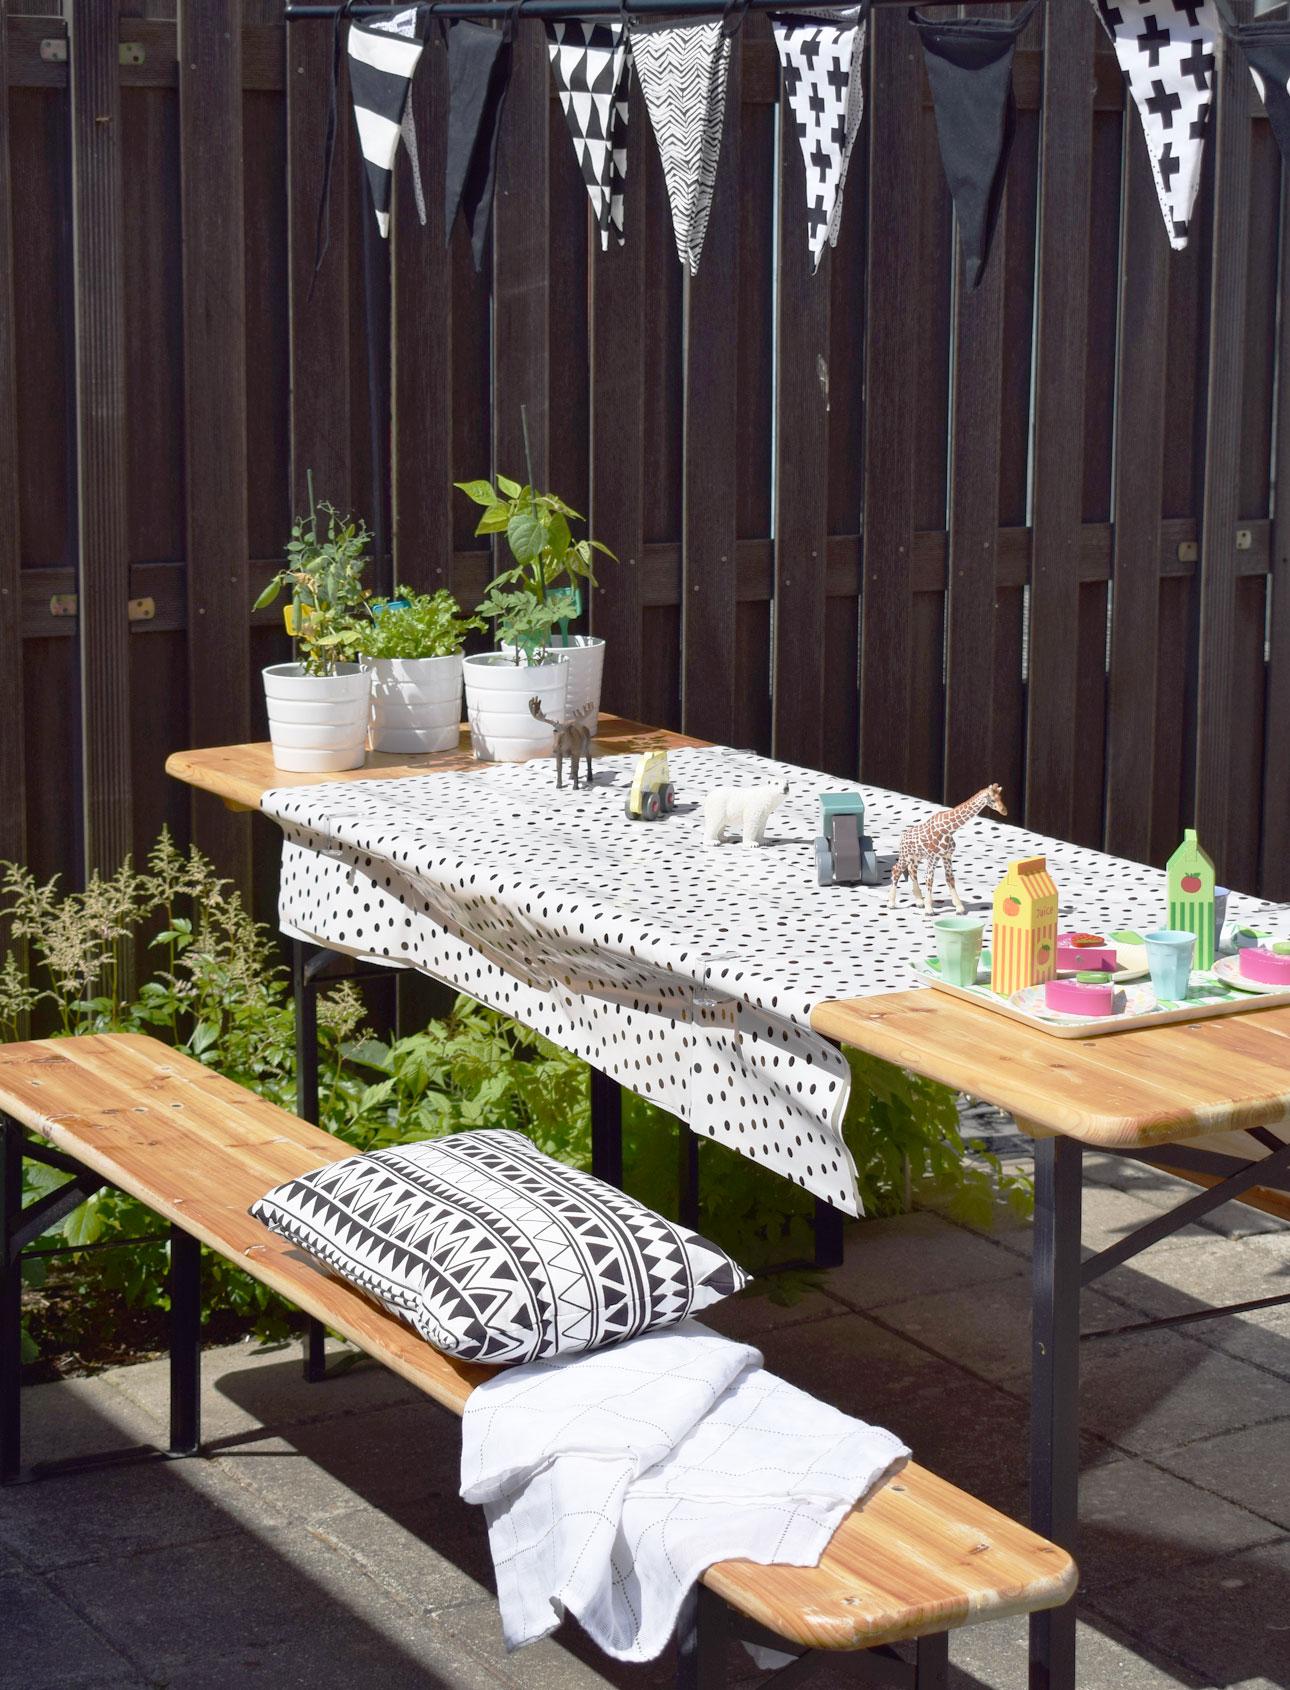 mamalifestyle tuin buiten tafel speelgoed slinger